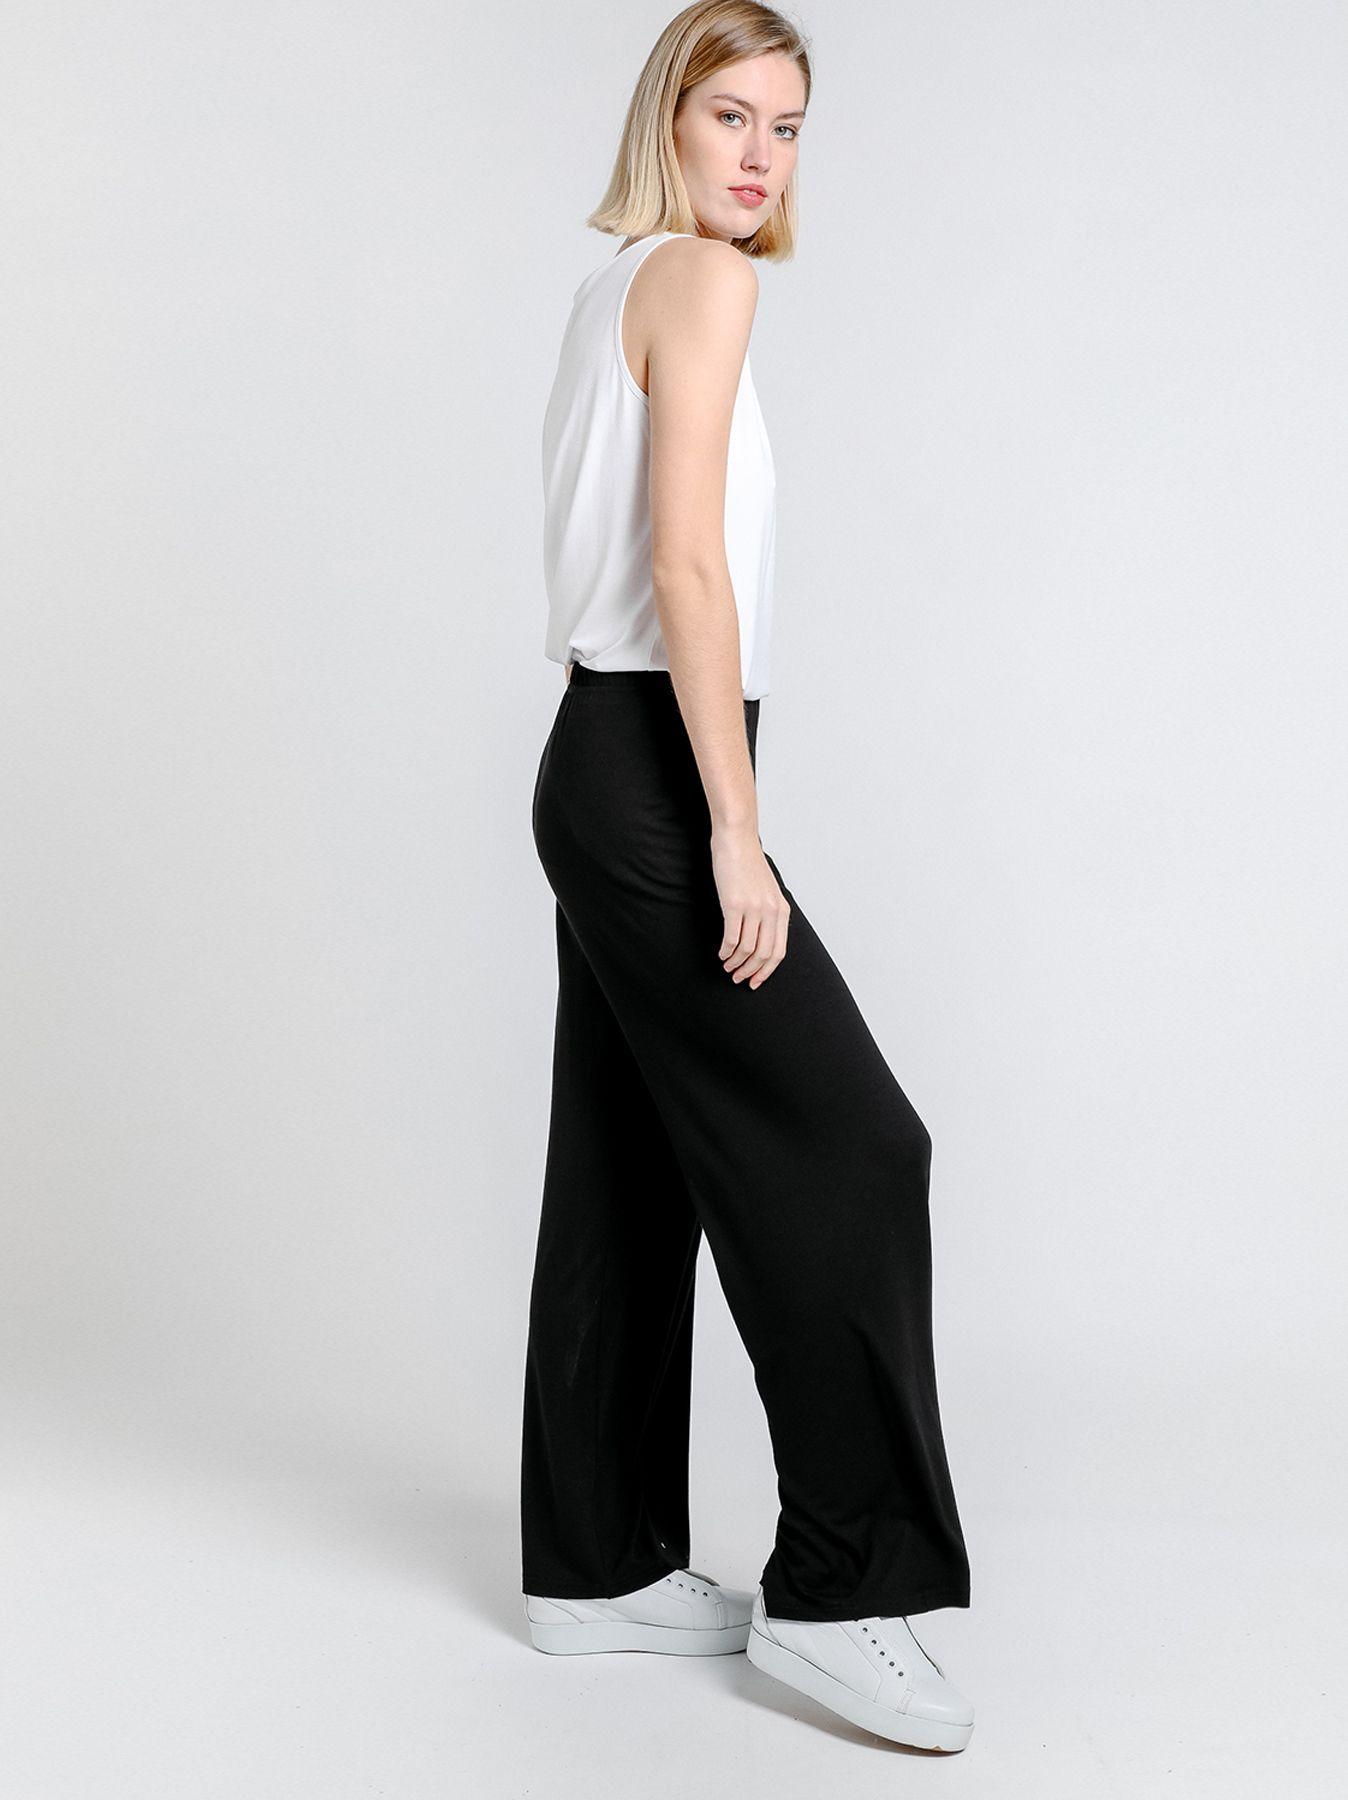 Pantalón elástico en color liso